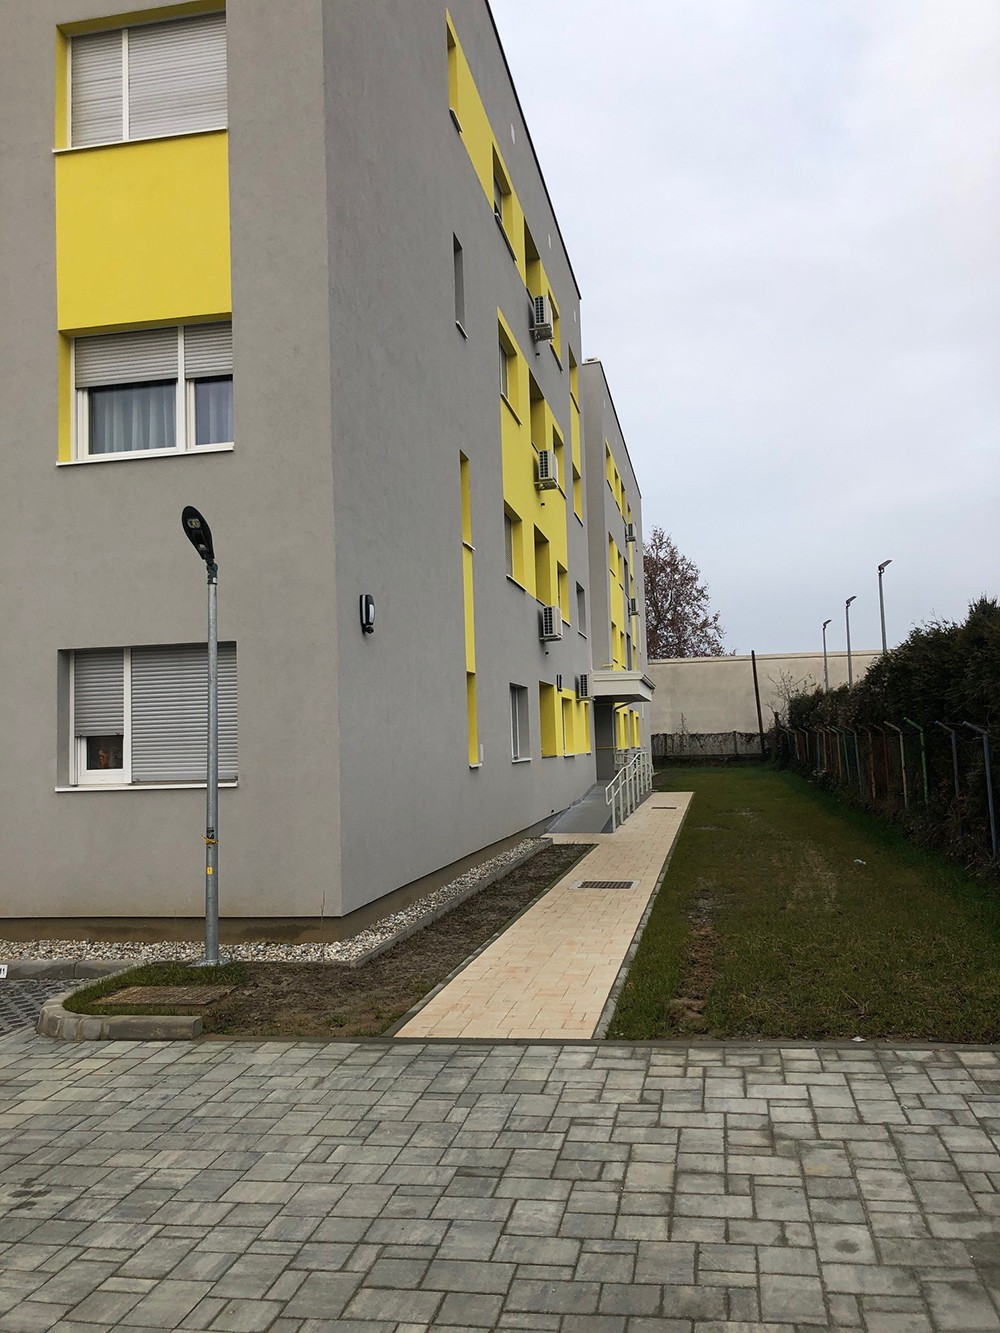 Stambena zgrada: Franjevačka 21